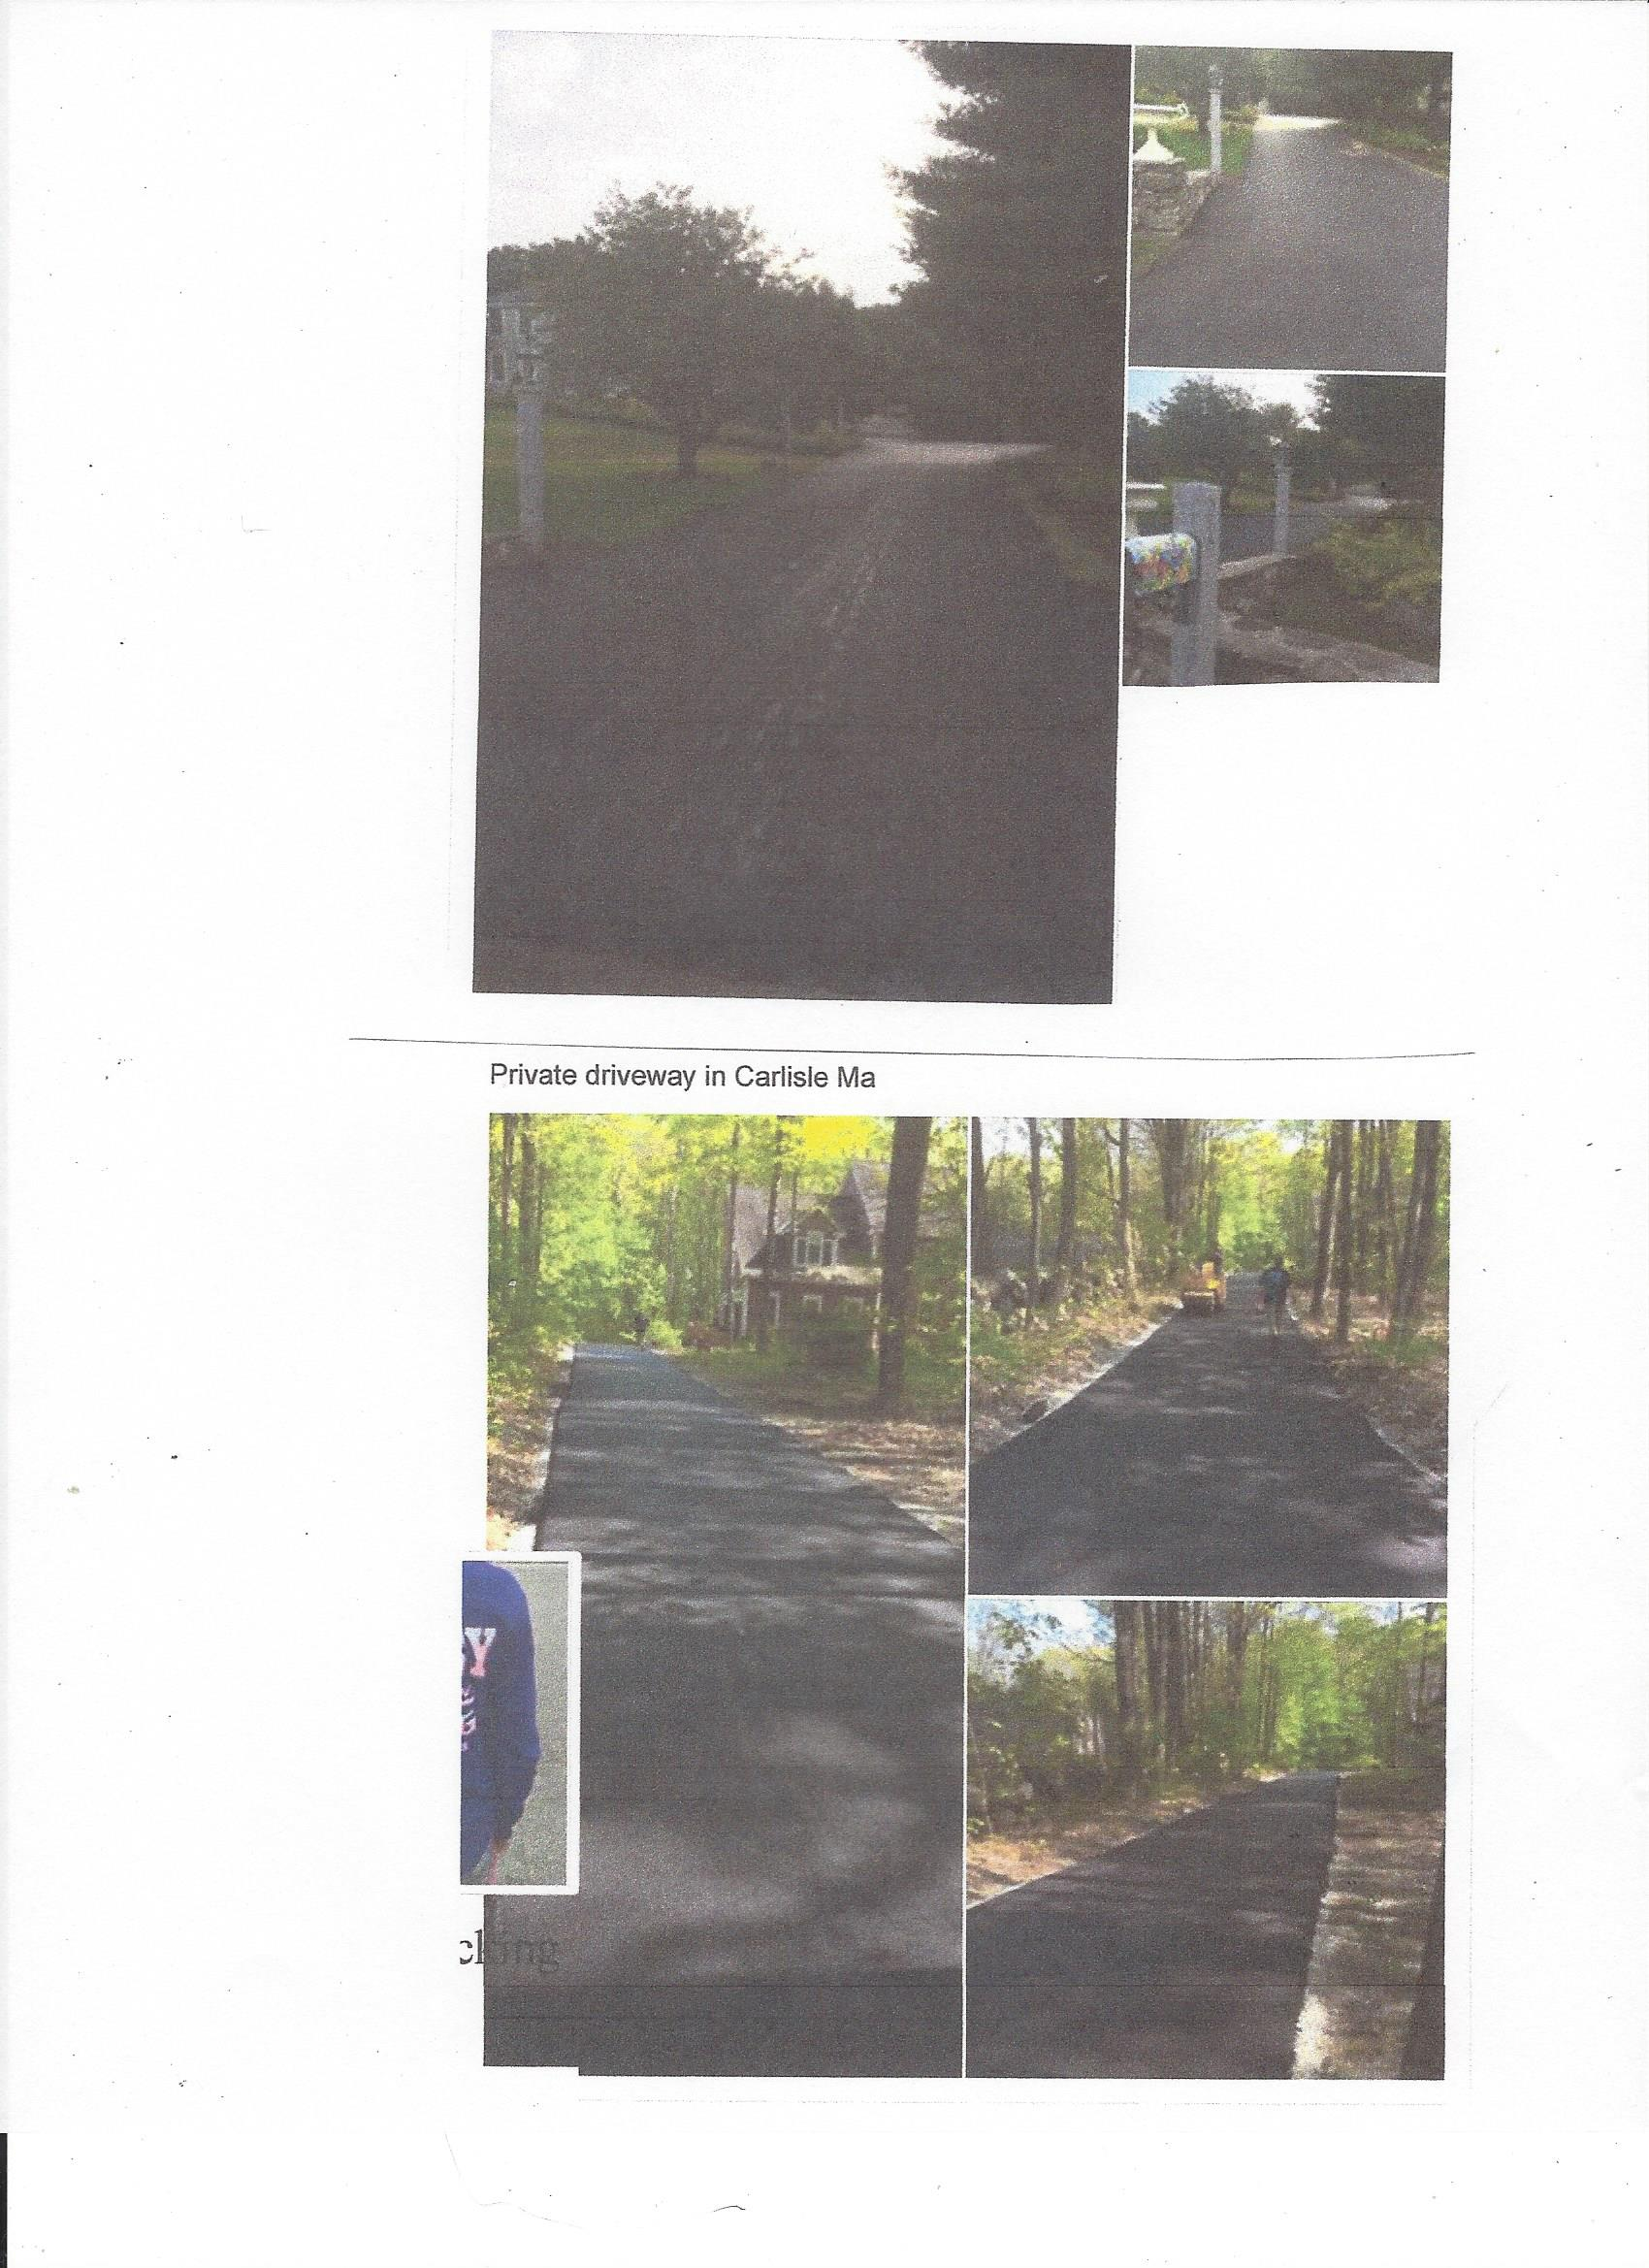 Bouley Trucking & Paving image 2